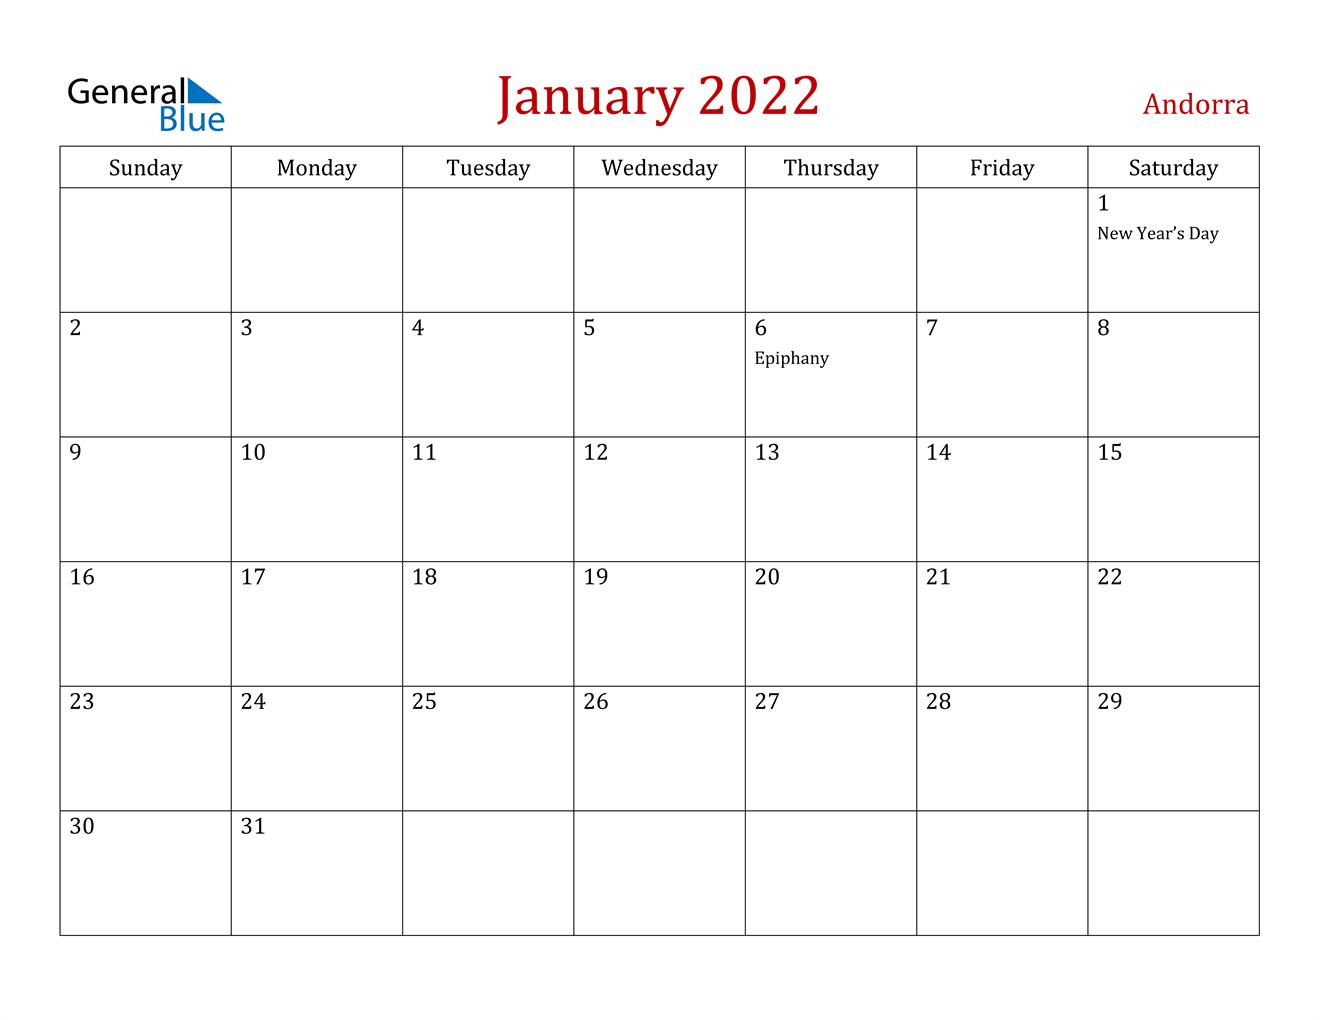 Andorra January 2022 Calendar With Holidays Intended For Calendar 2022 January Printable